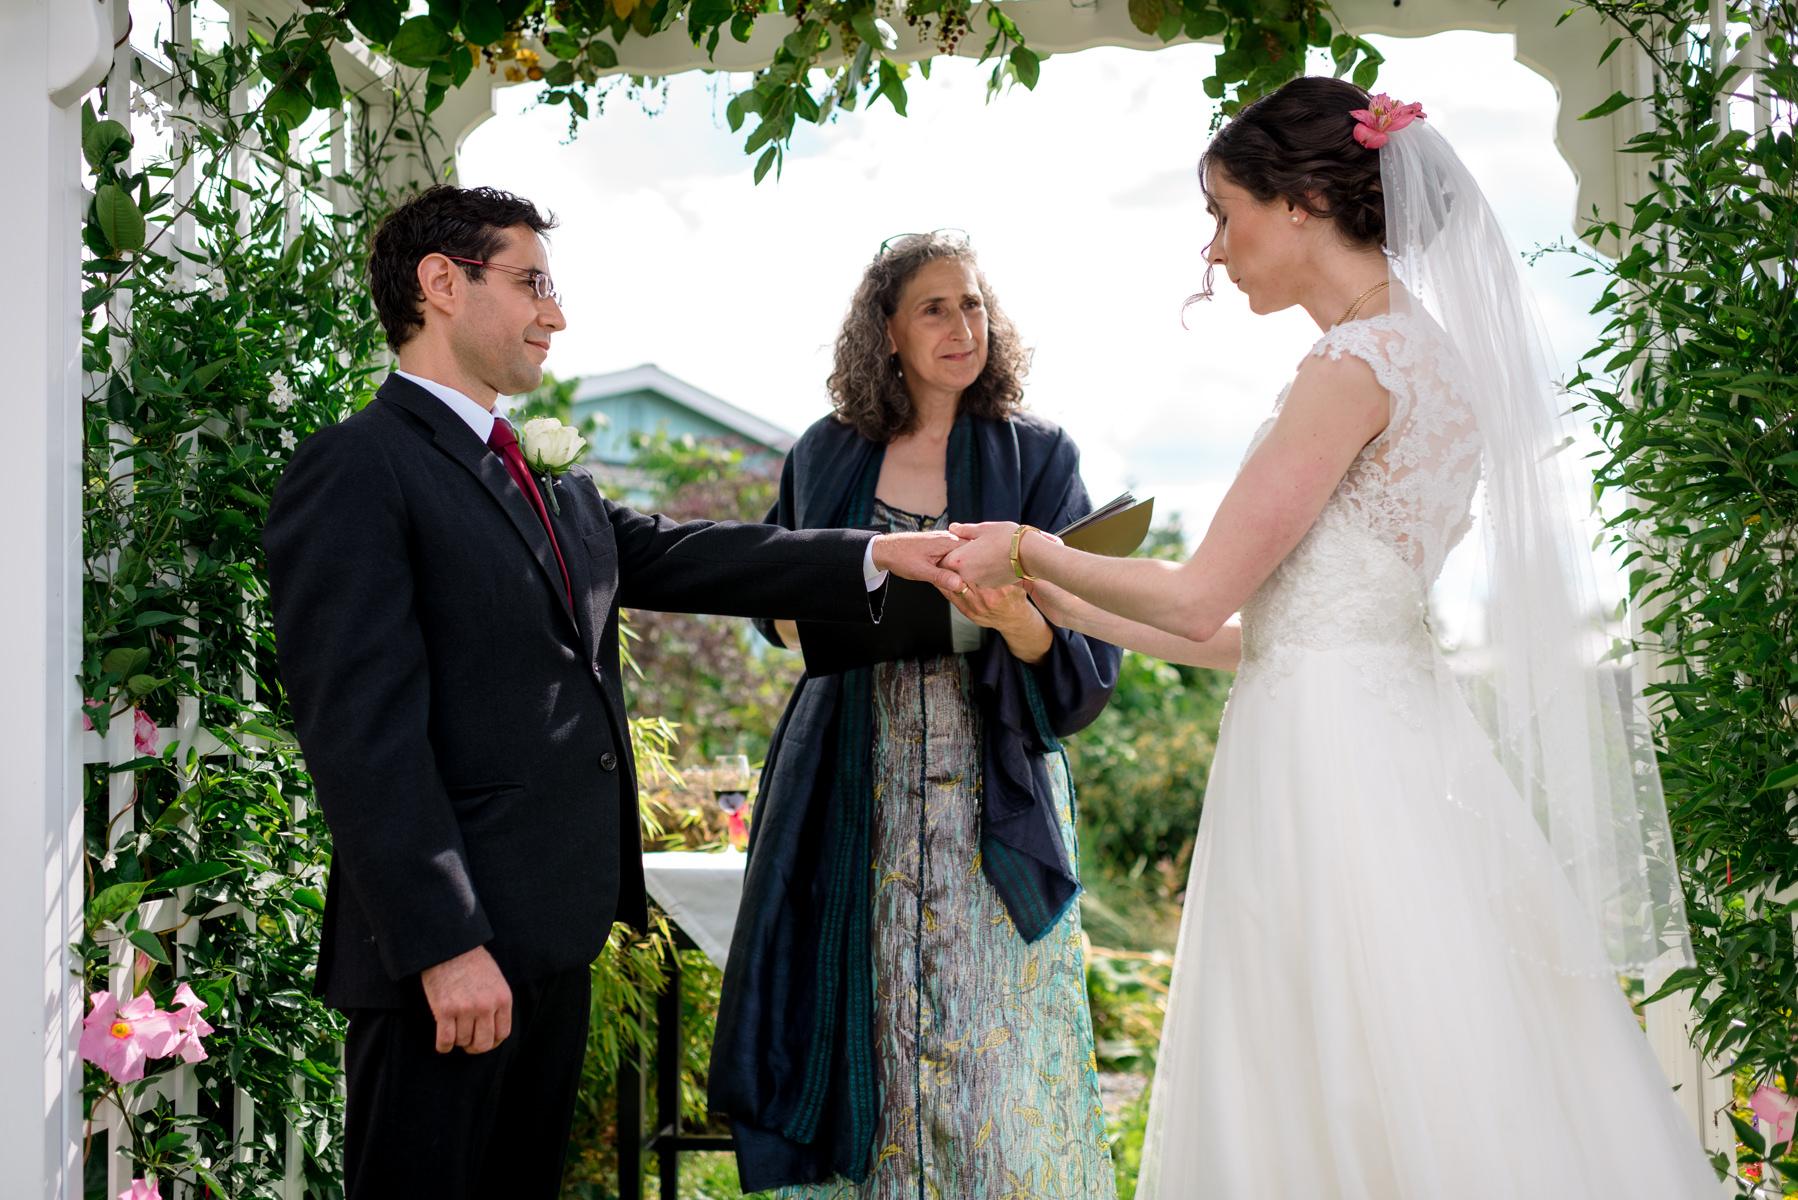 Andrew Tat - Documentary Wedding Photography - Kirkland, Washington - Emily & Cuauh - 13.JPG